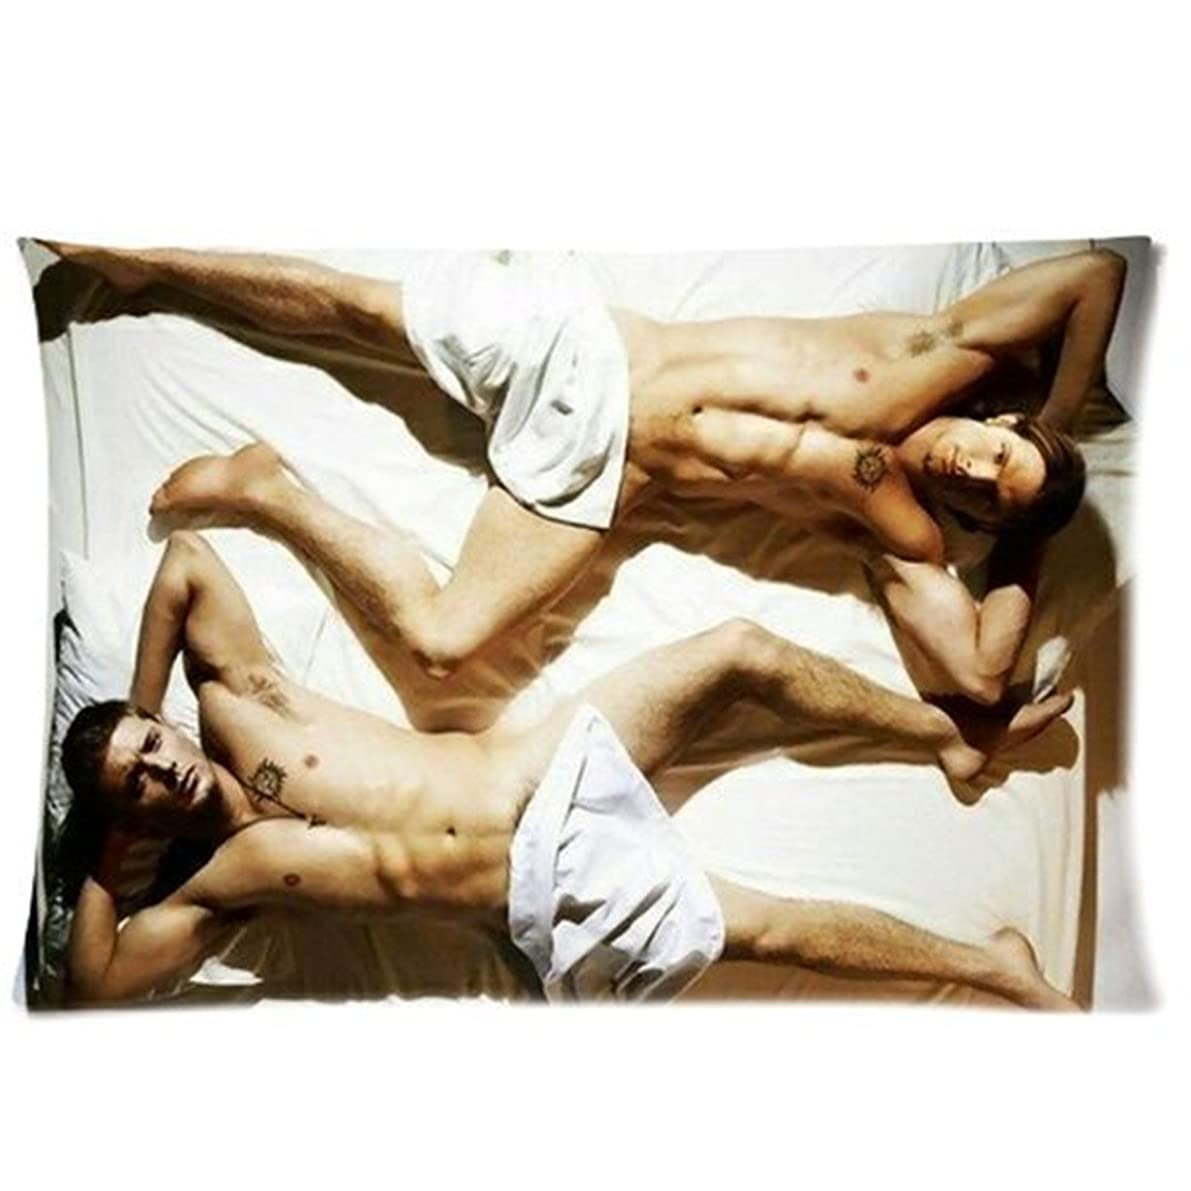 Stroggl Generic Supernatural Jensen Ackles and Jared Padalecki Shirtless Pillowcase